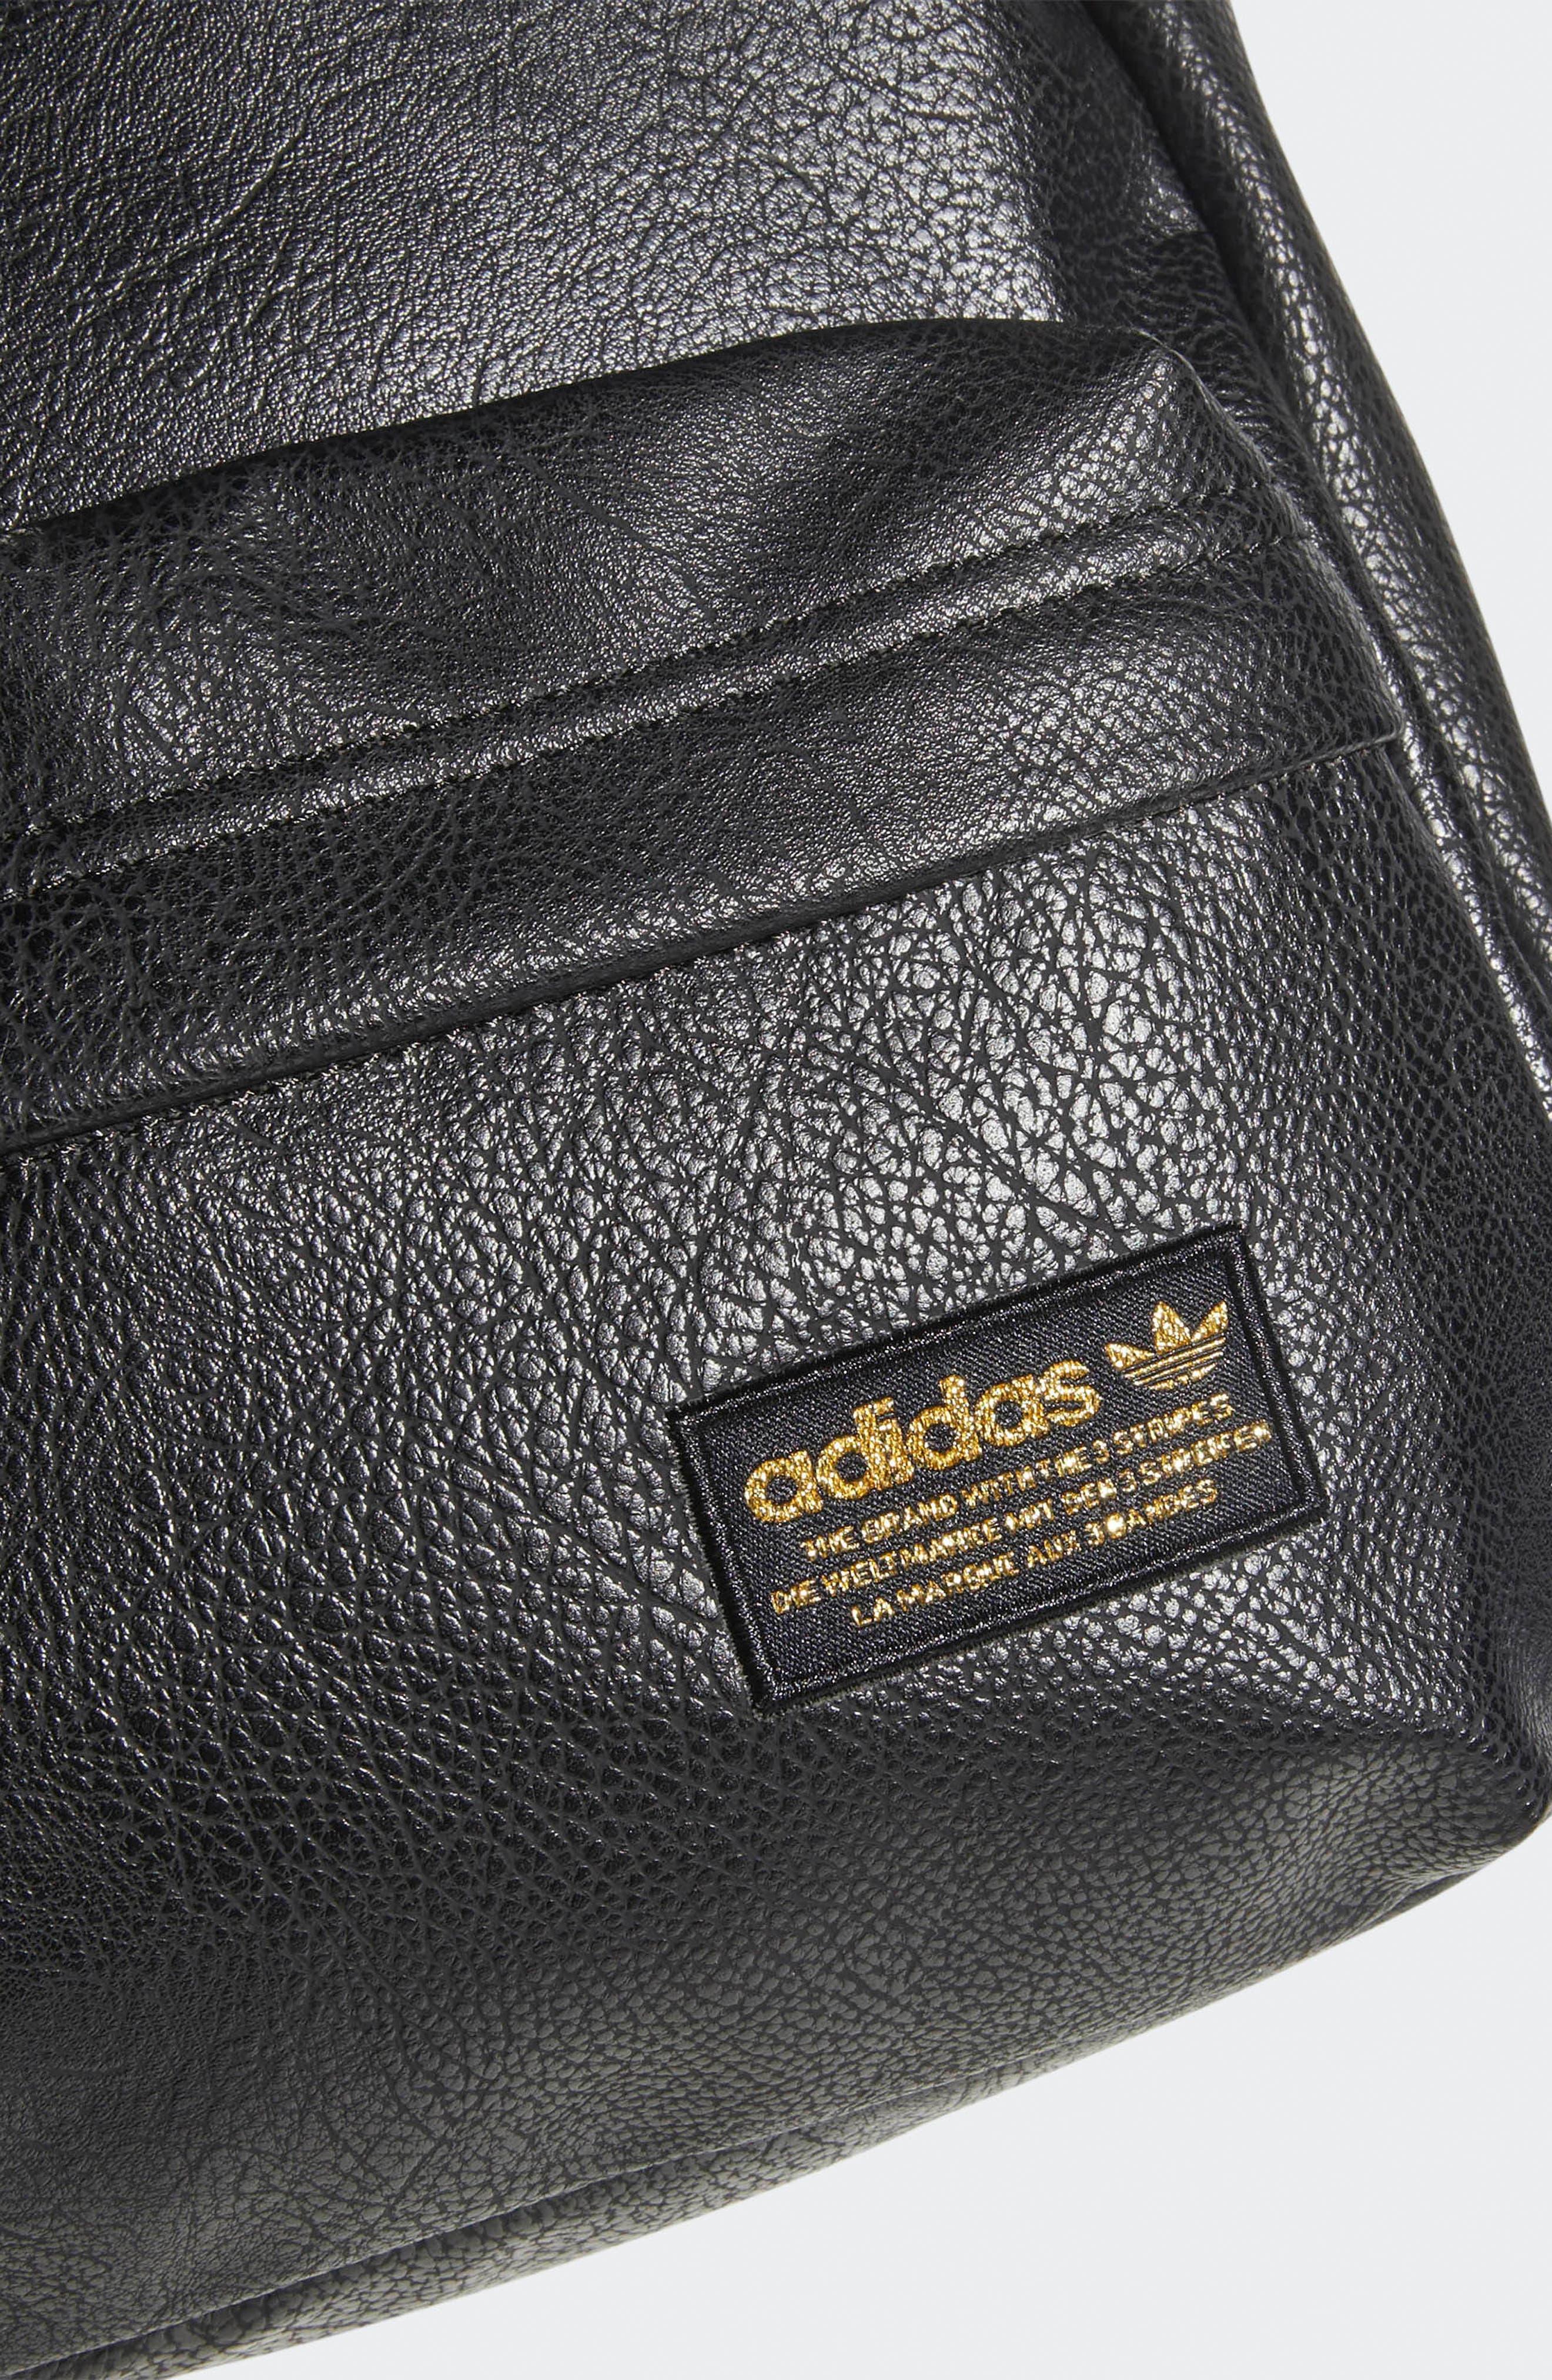 ADIDAS ORIGINALS, National Compact Backpack, Alternate thumbnail 5, color, 001